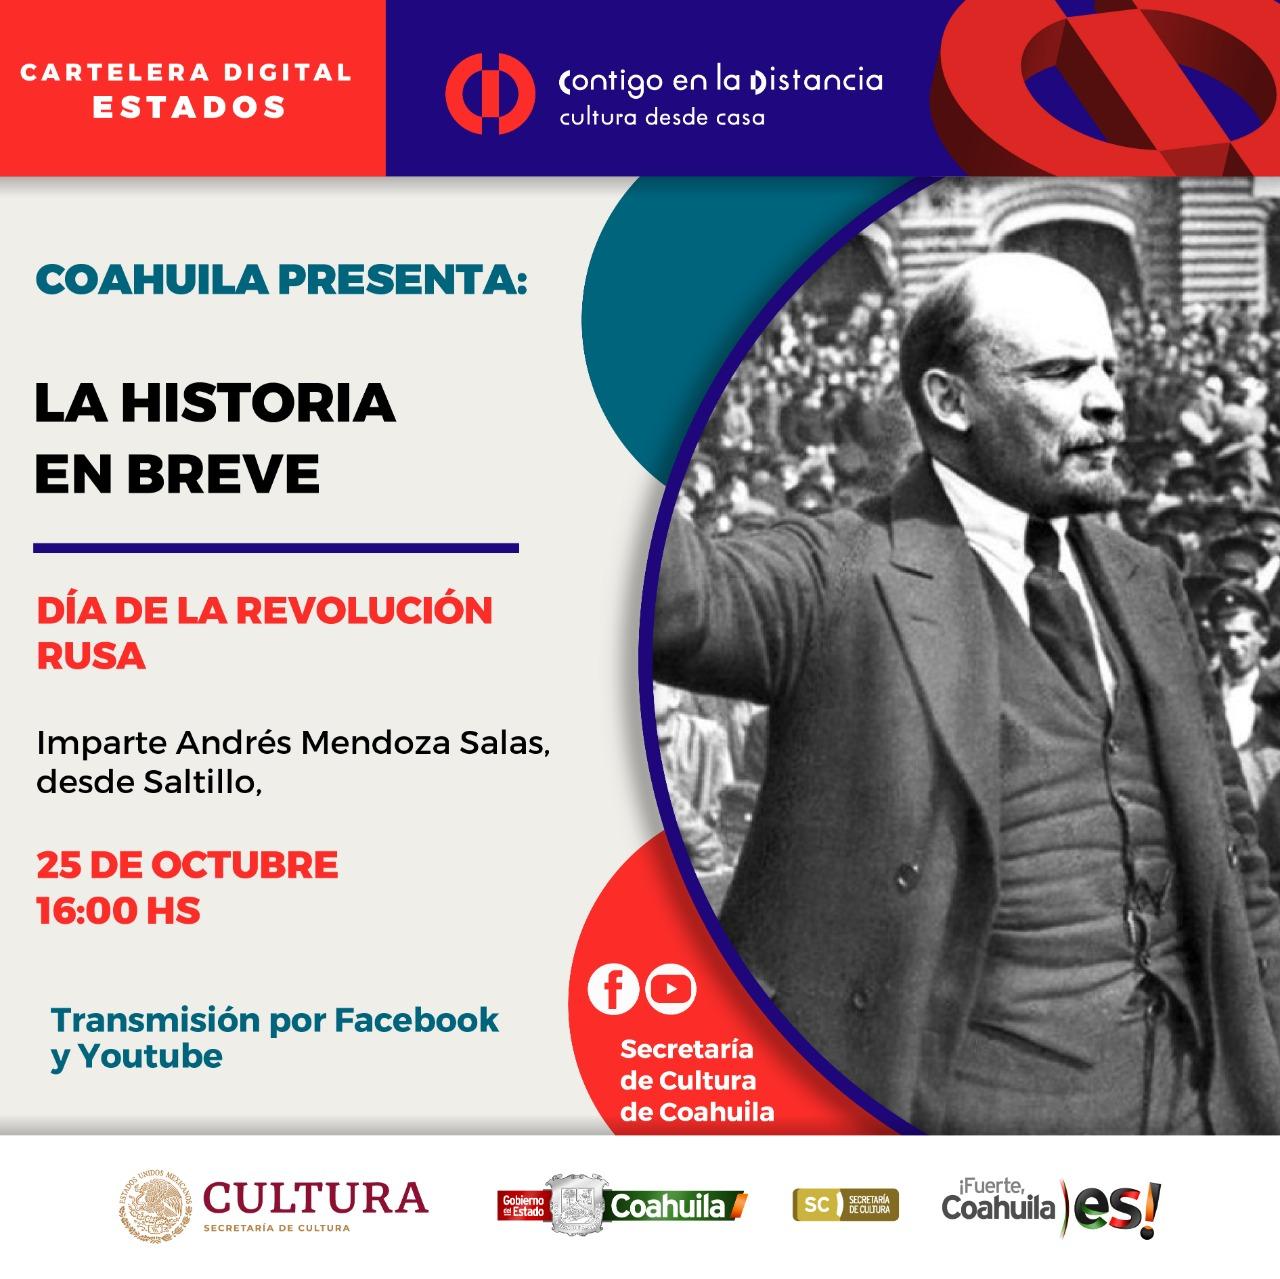 COAHUILA PRESENTA: LA HISTORIA EN BREVE